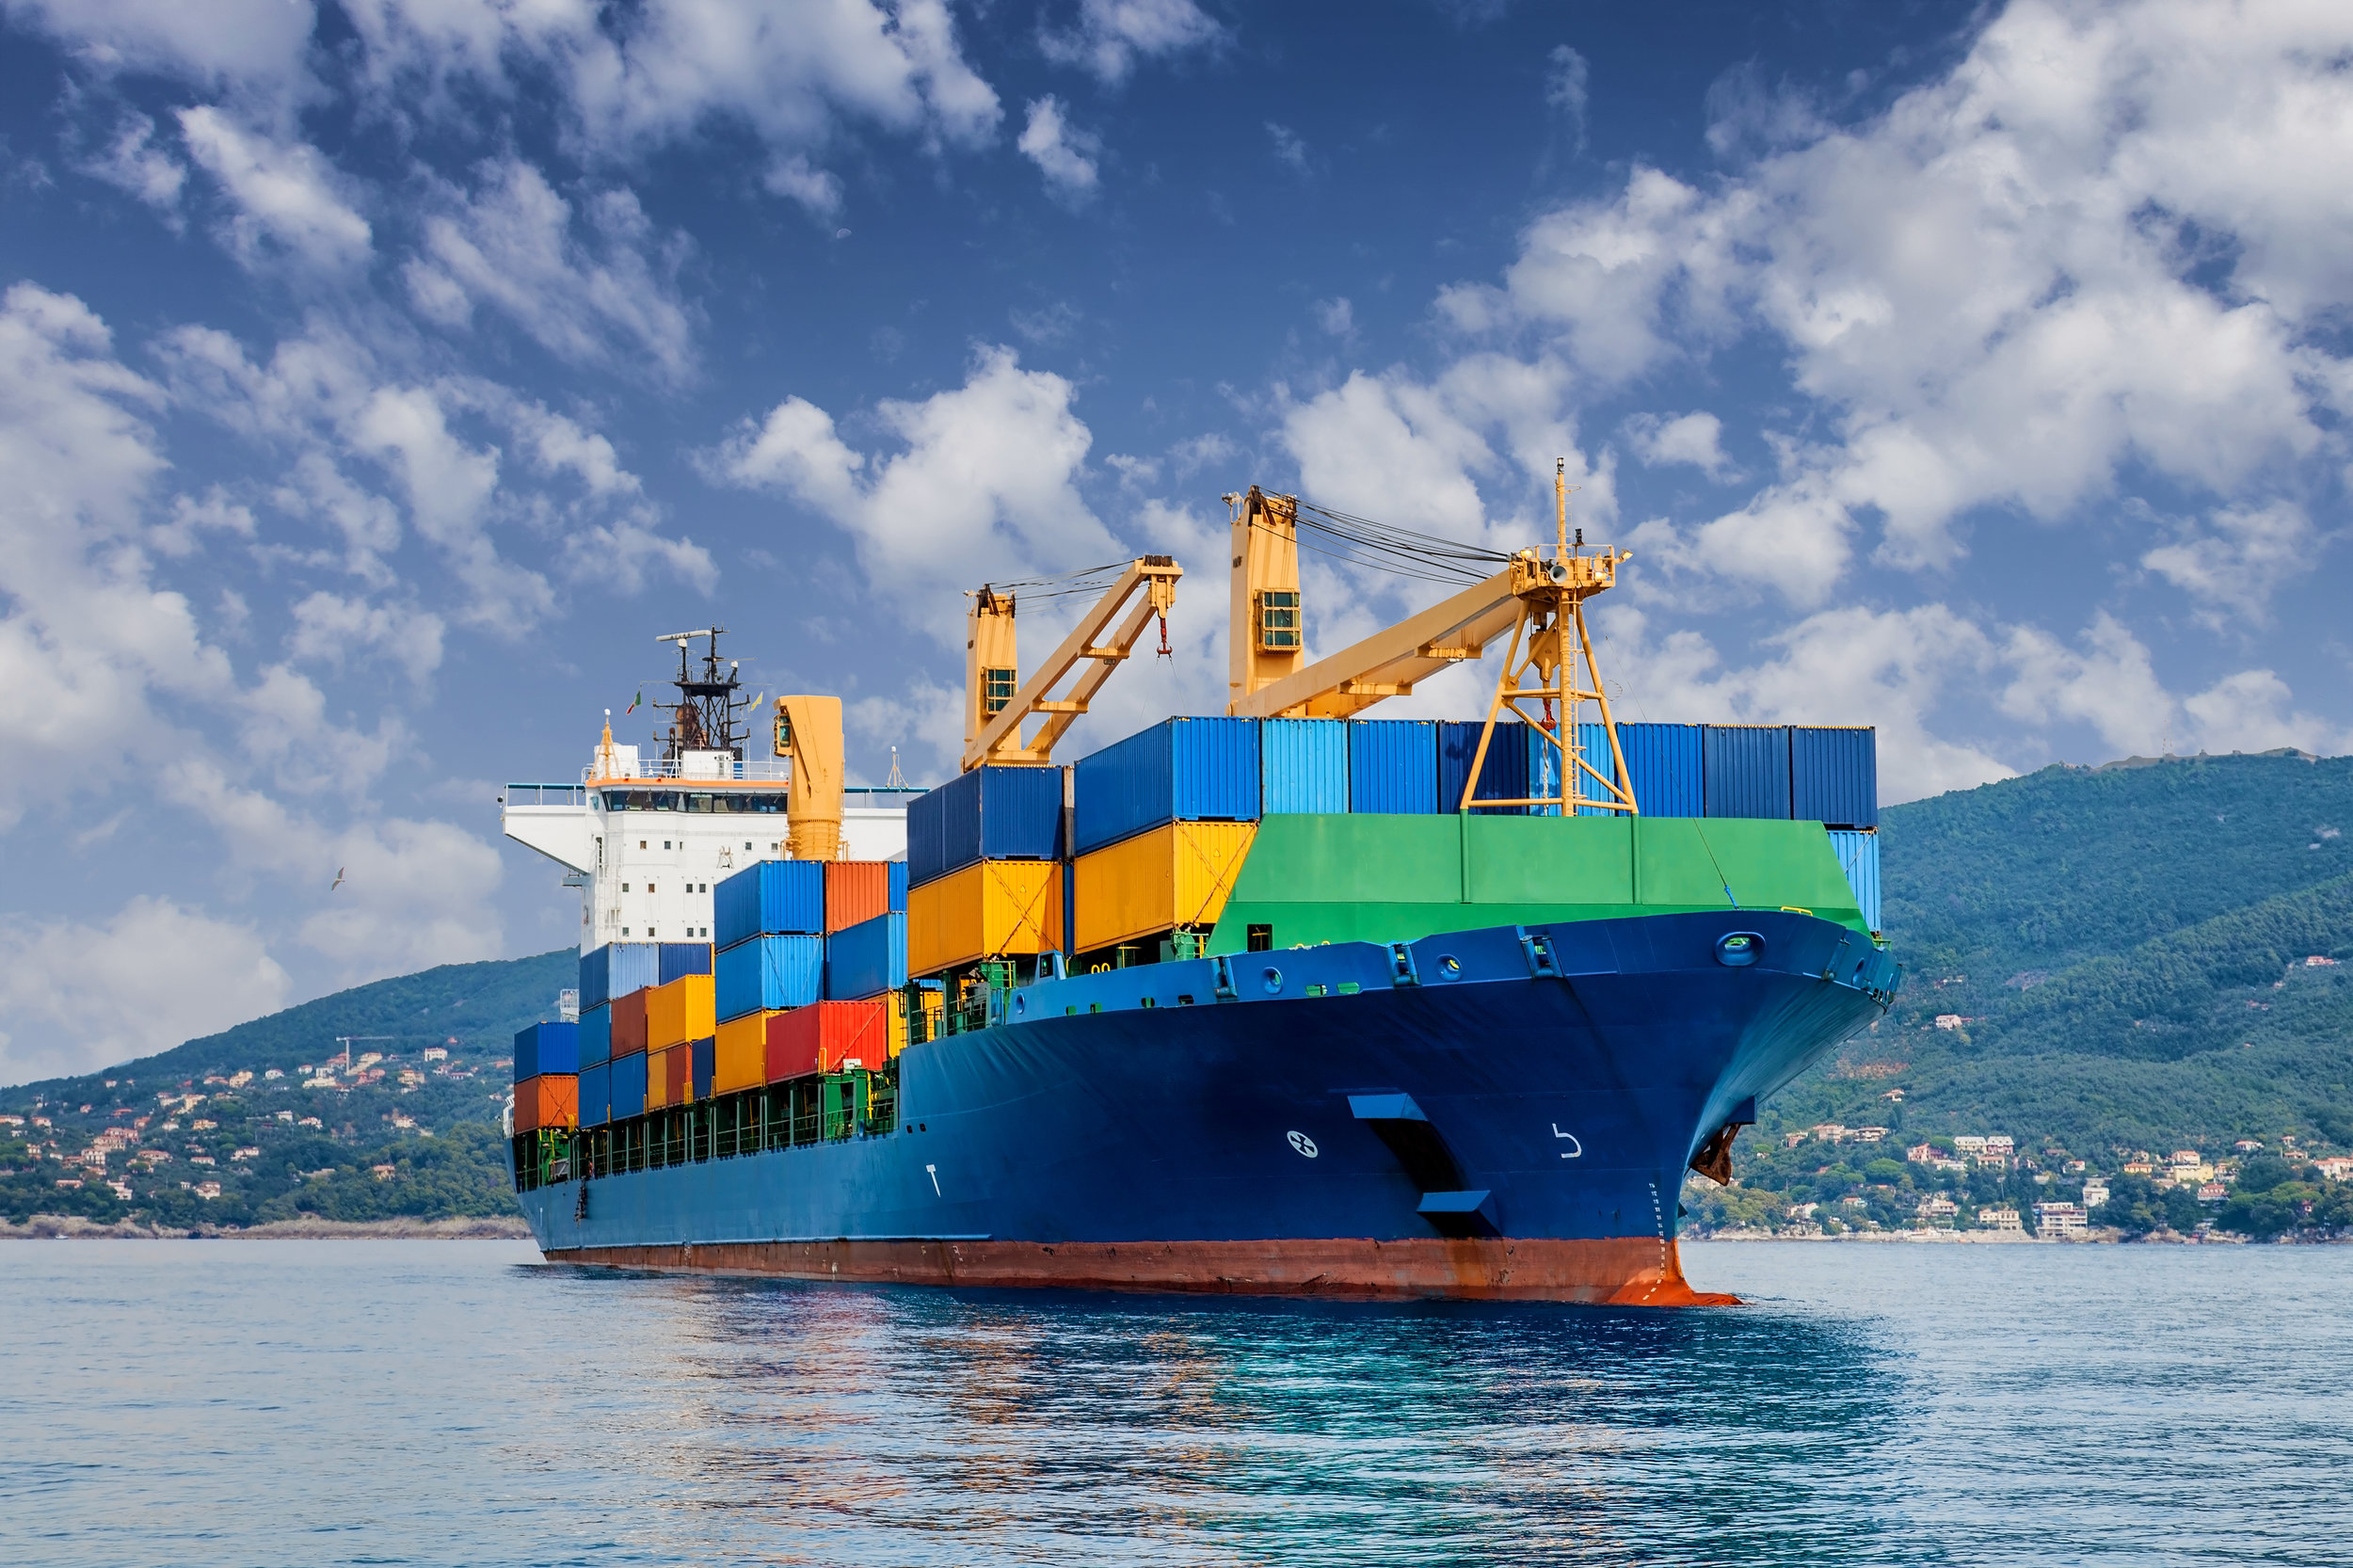 CARGO SHIP iStock-480919874.jpg